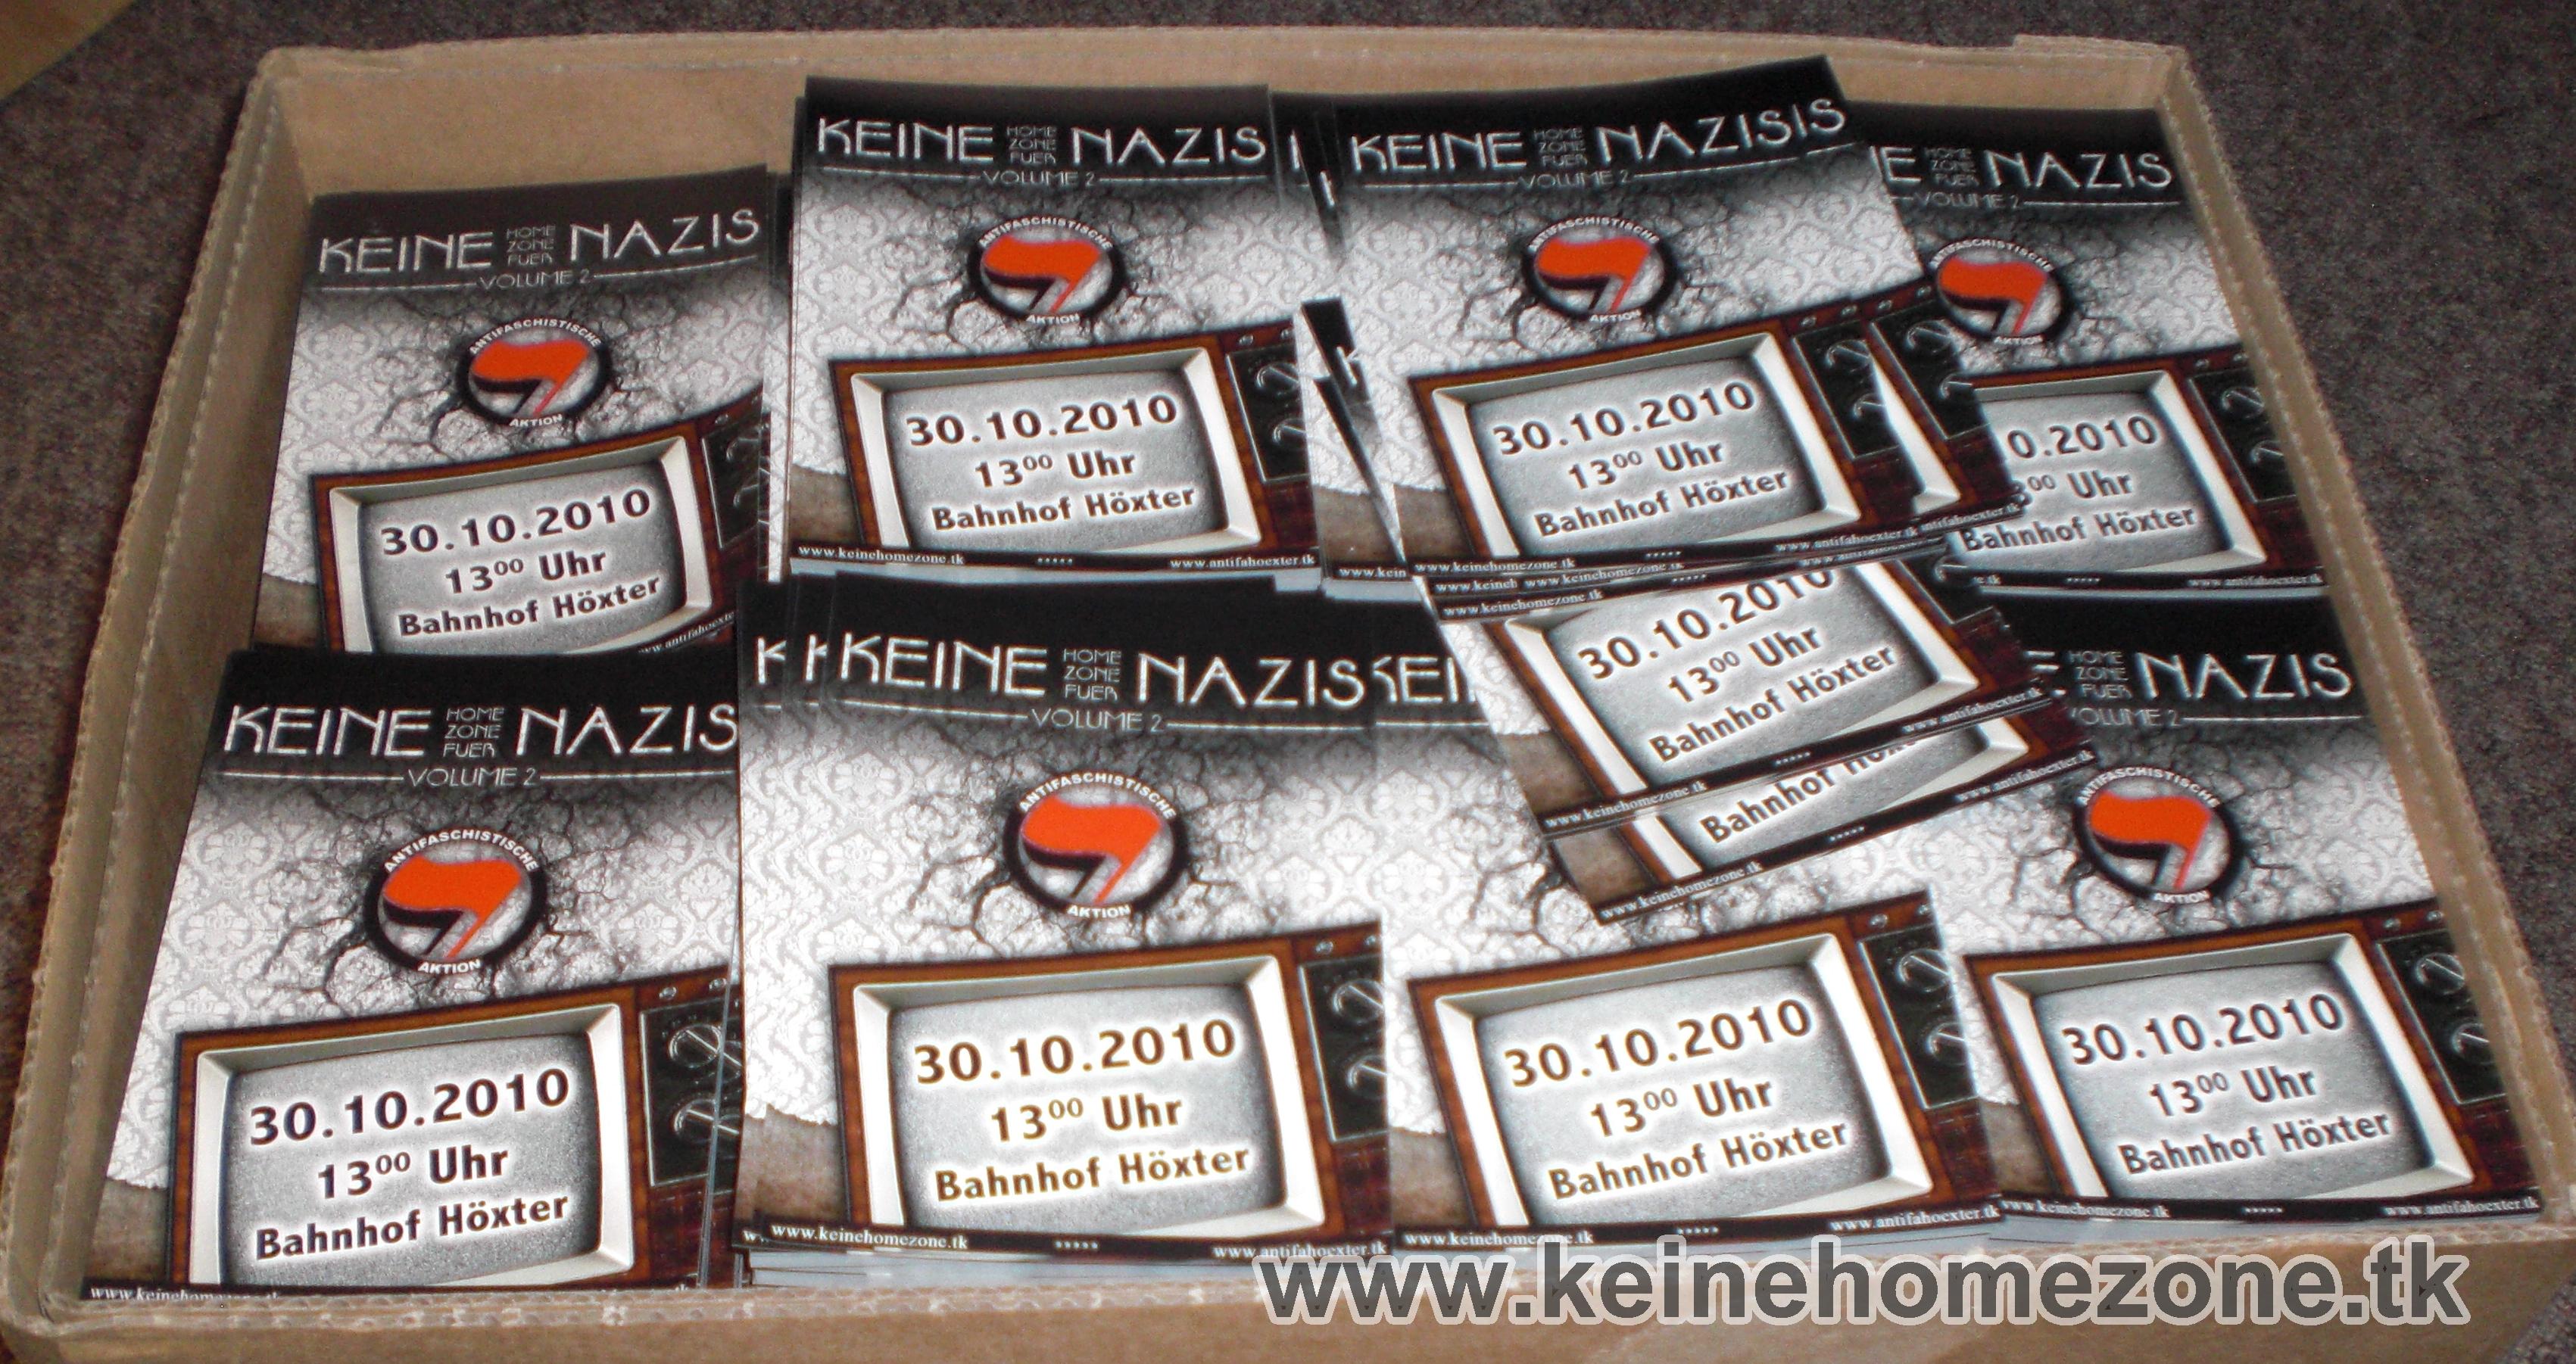 http://keinehomezone.blogsport.de/images/flyerpaket.JPG